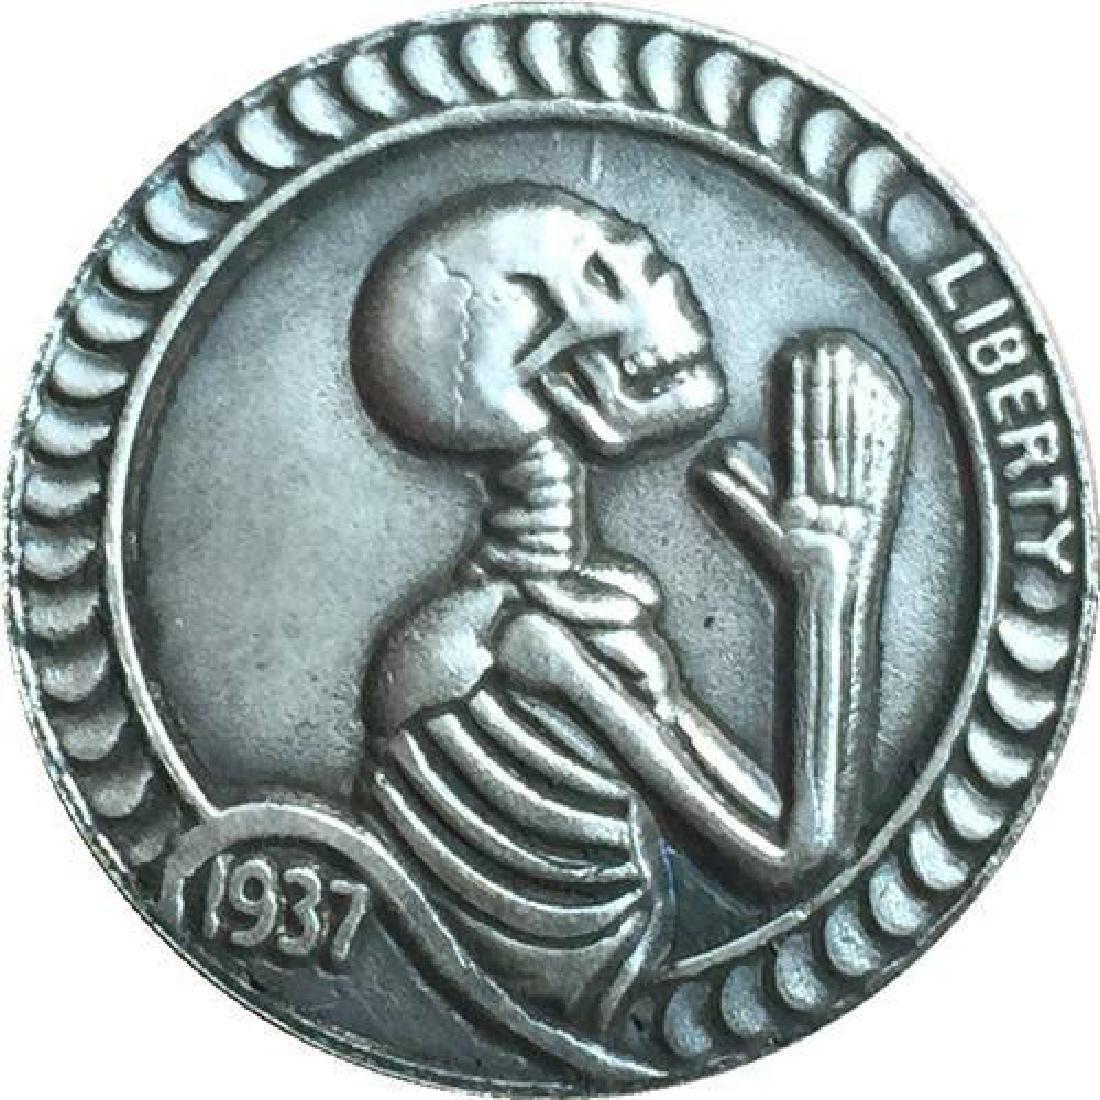 USA Praying Skeleton Buffalo Coin